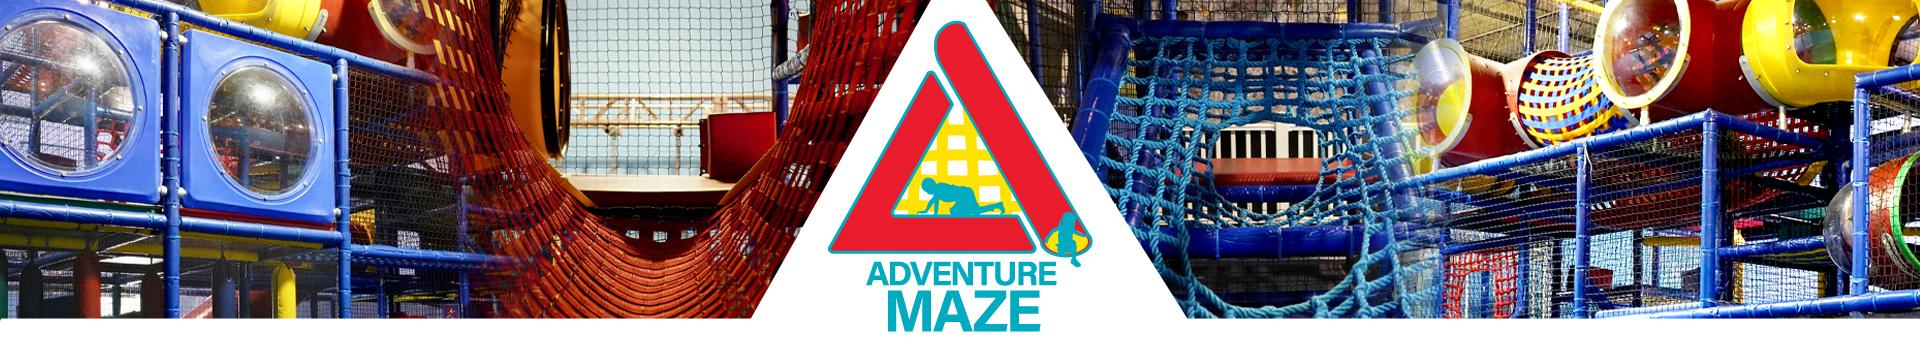 Adventure Maze